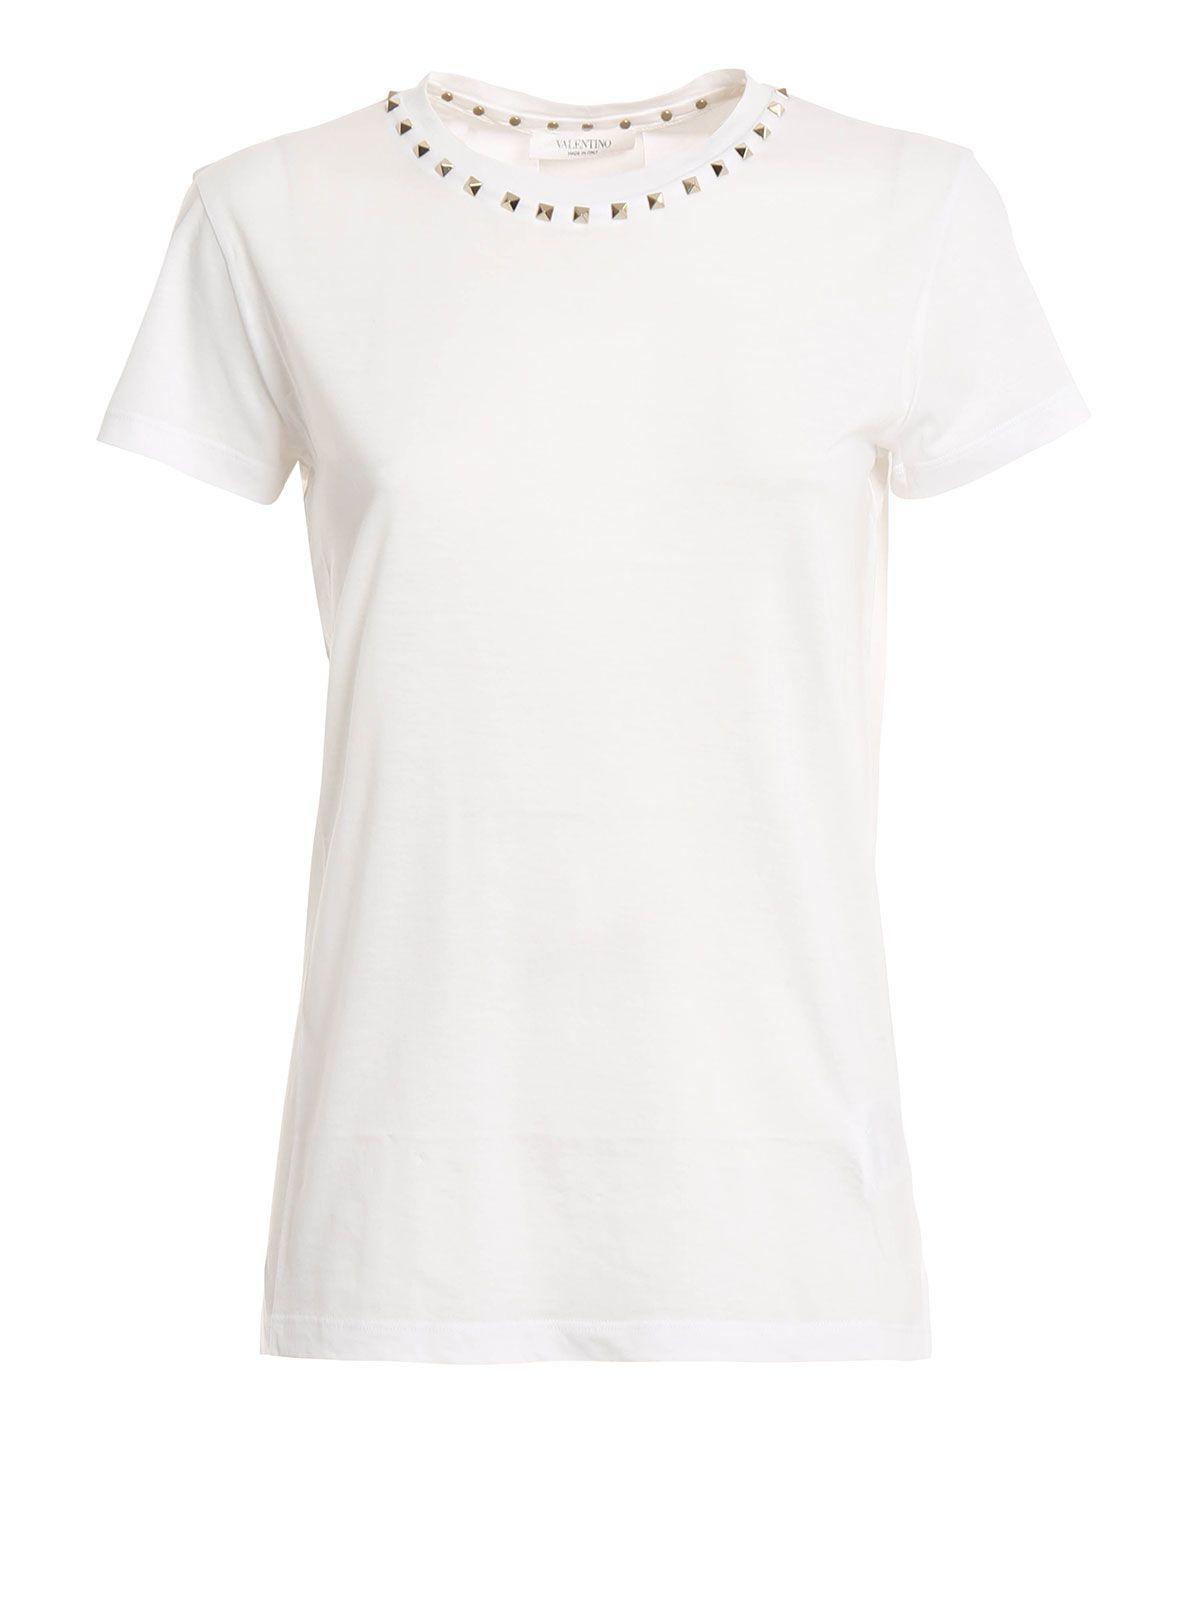 Valentino Rockstud Embellished T-shirt